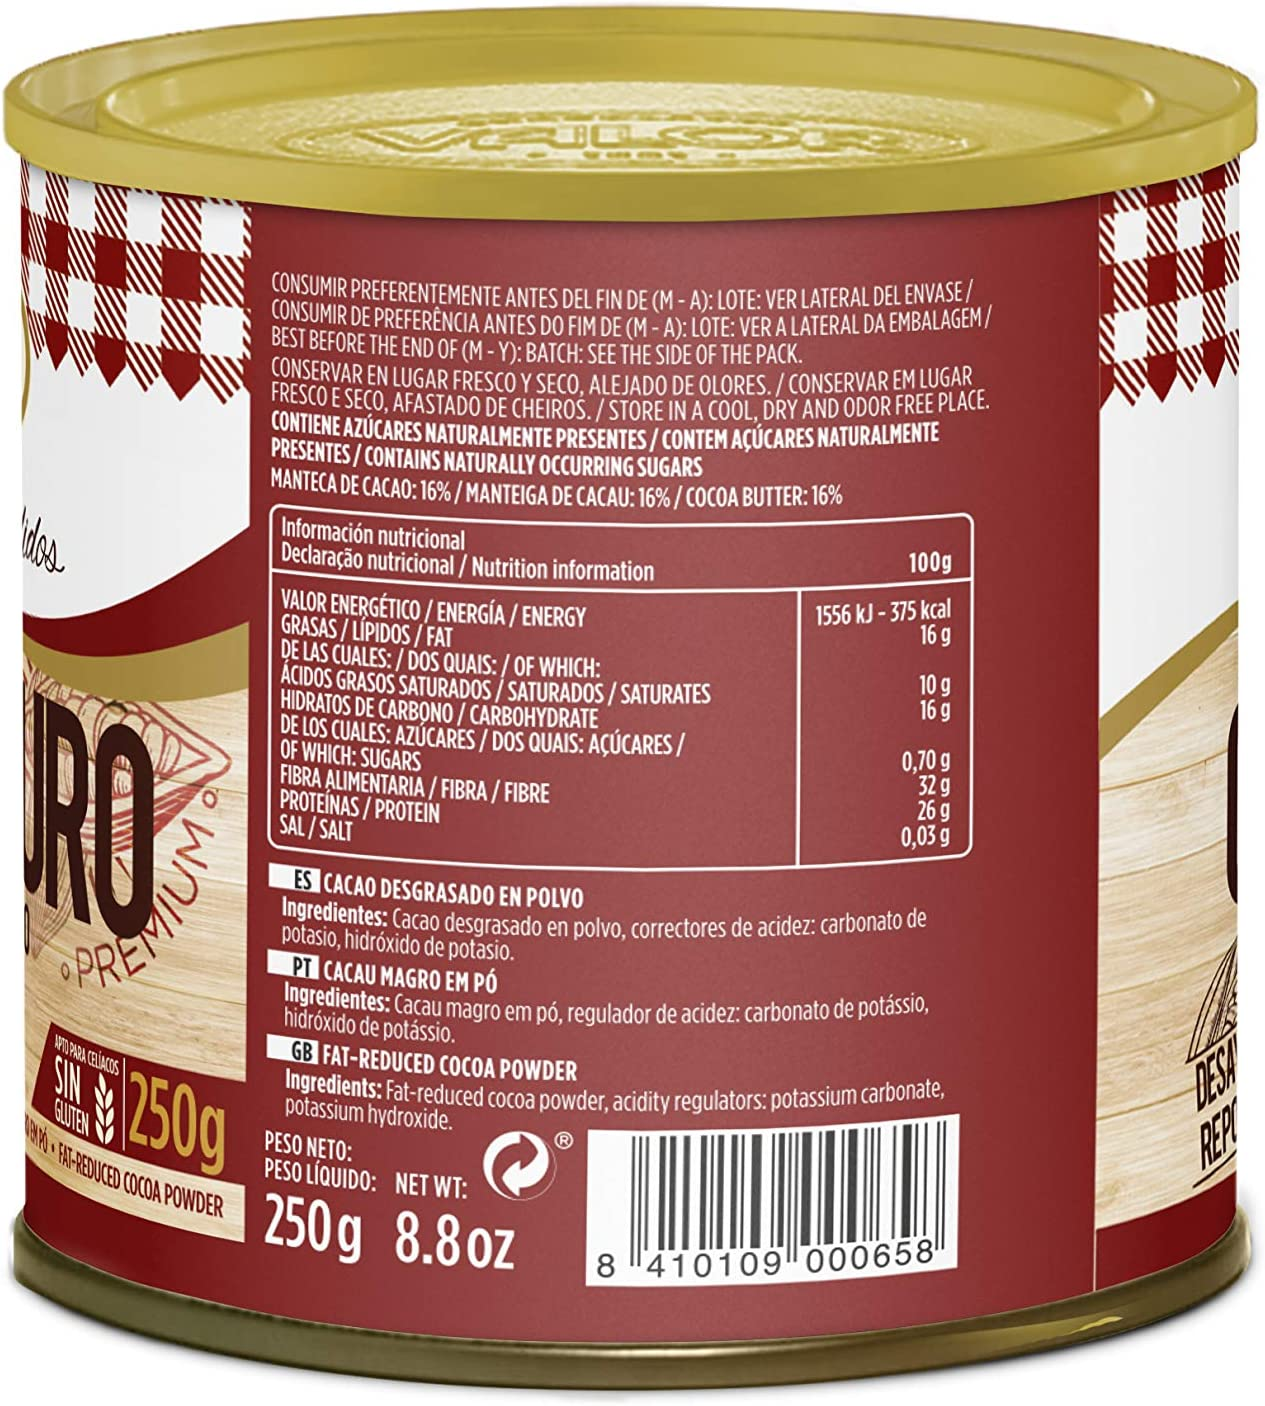 Chocolates Valor Cacao Puro en Polvo, Tamaño Ênico, 250g